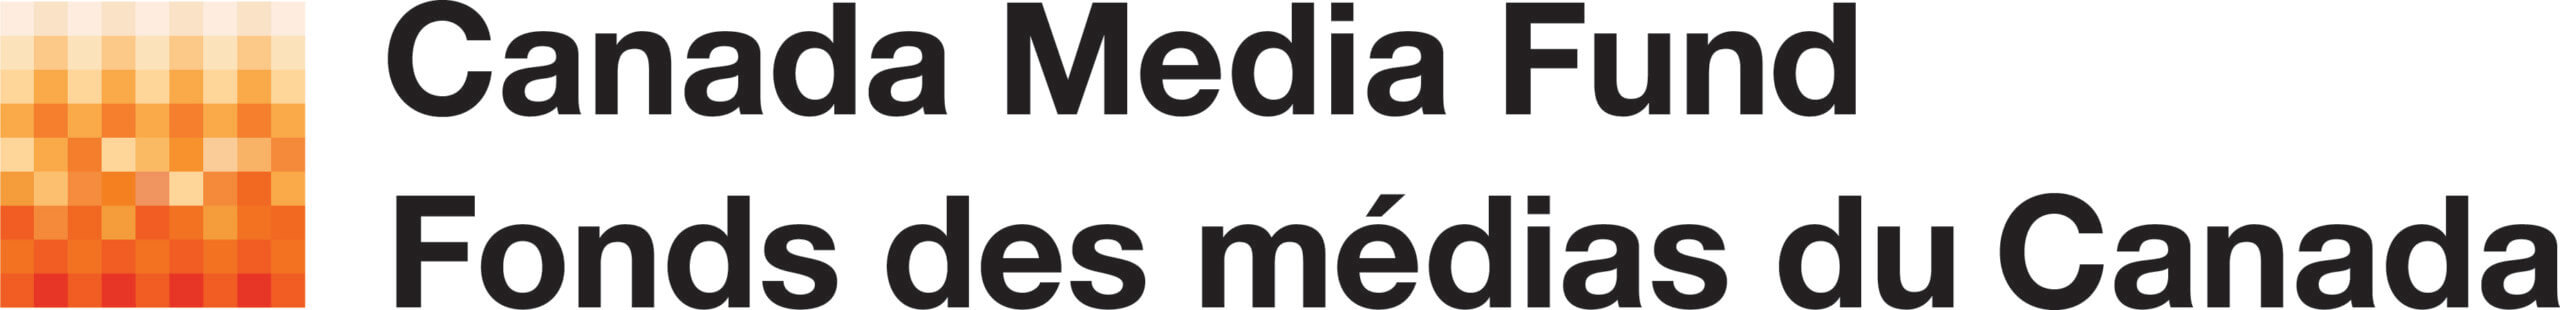 Logo_CMF_FMC_4C_edit